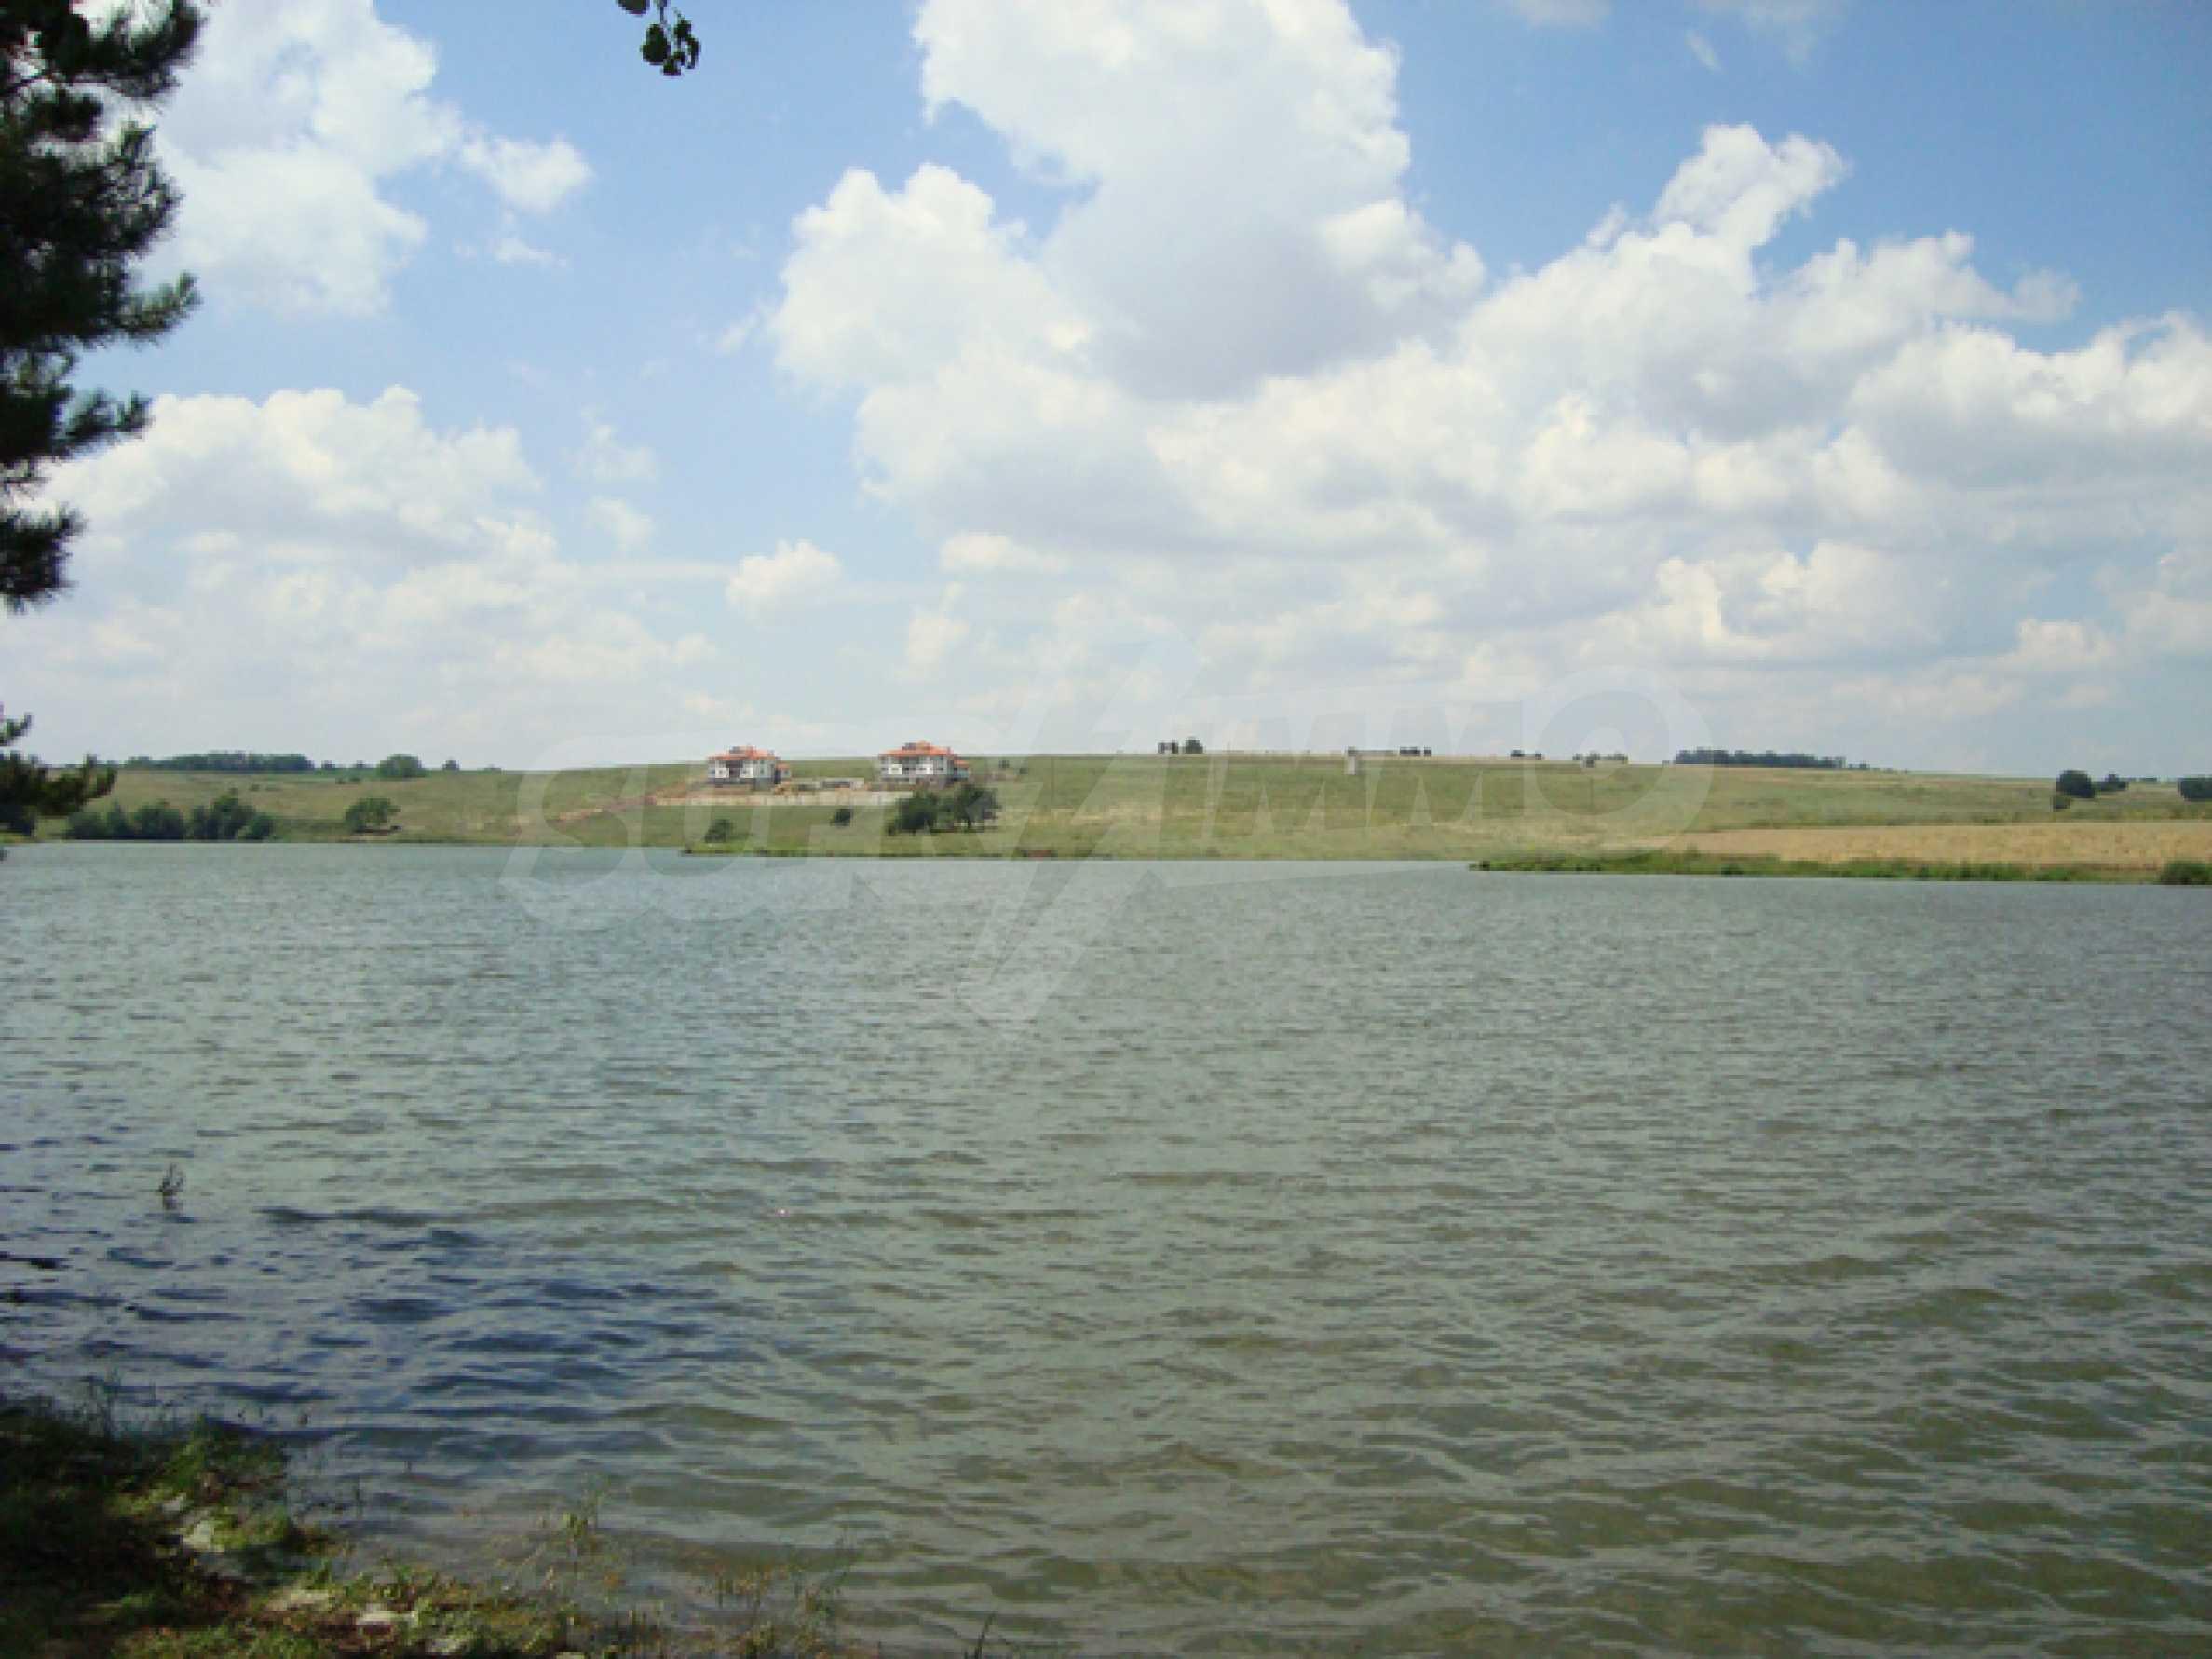 Chalet am Ufer des Nikolaevka-Damms 27